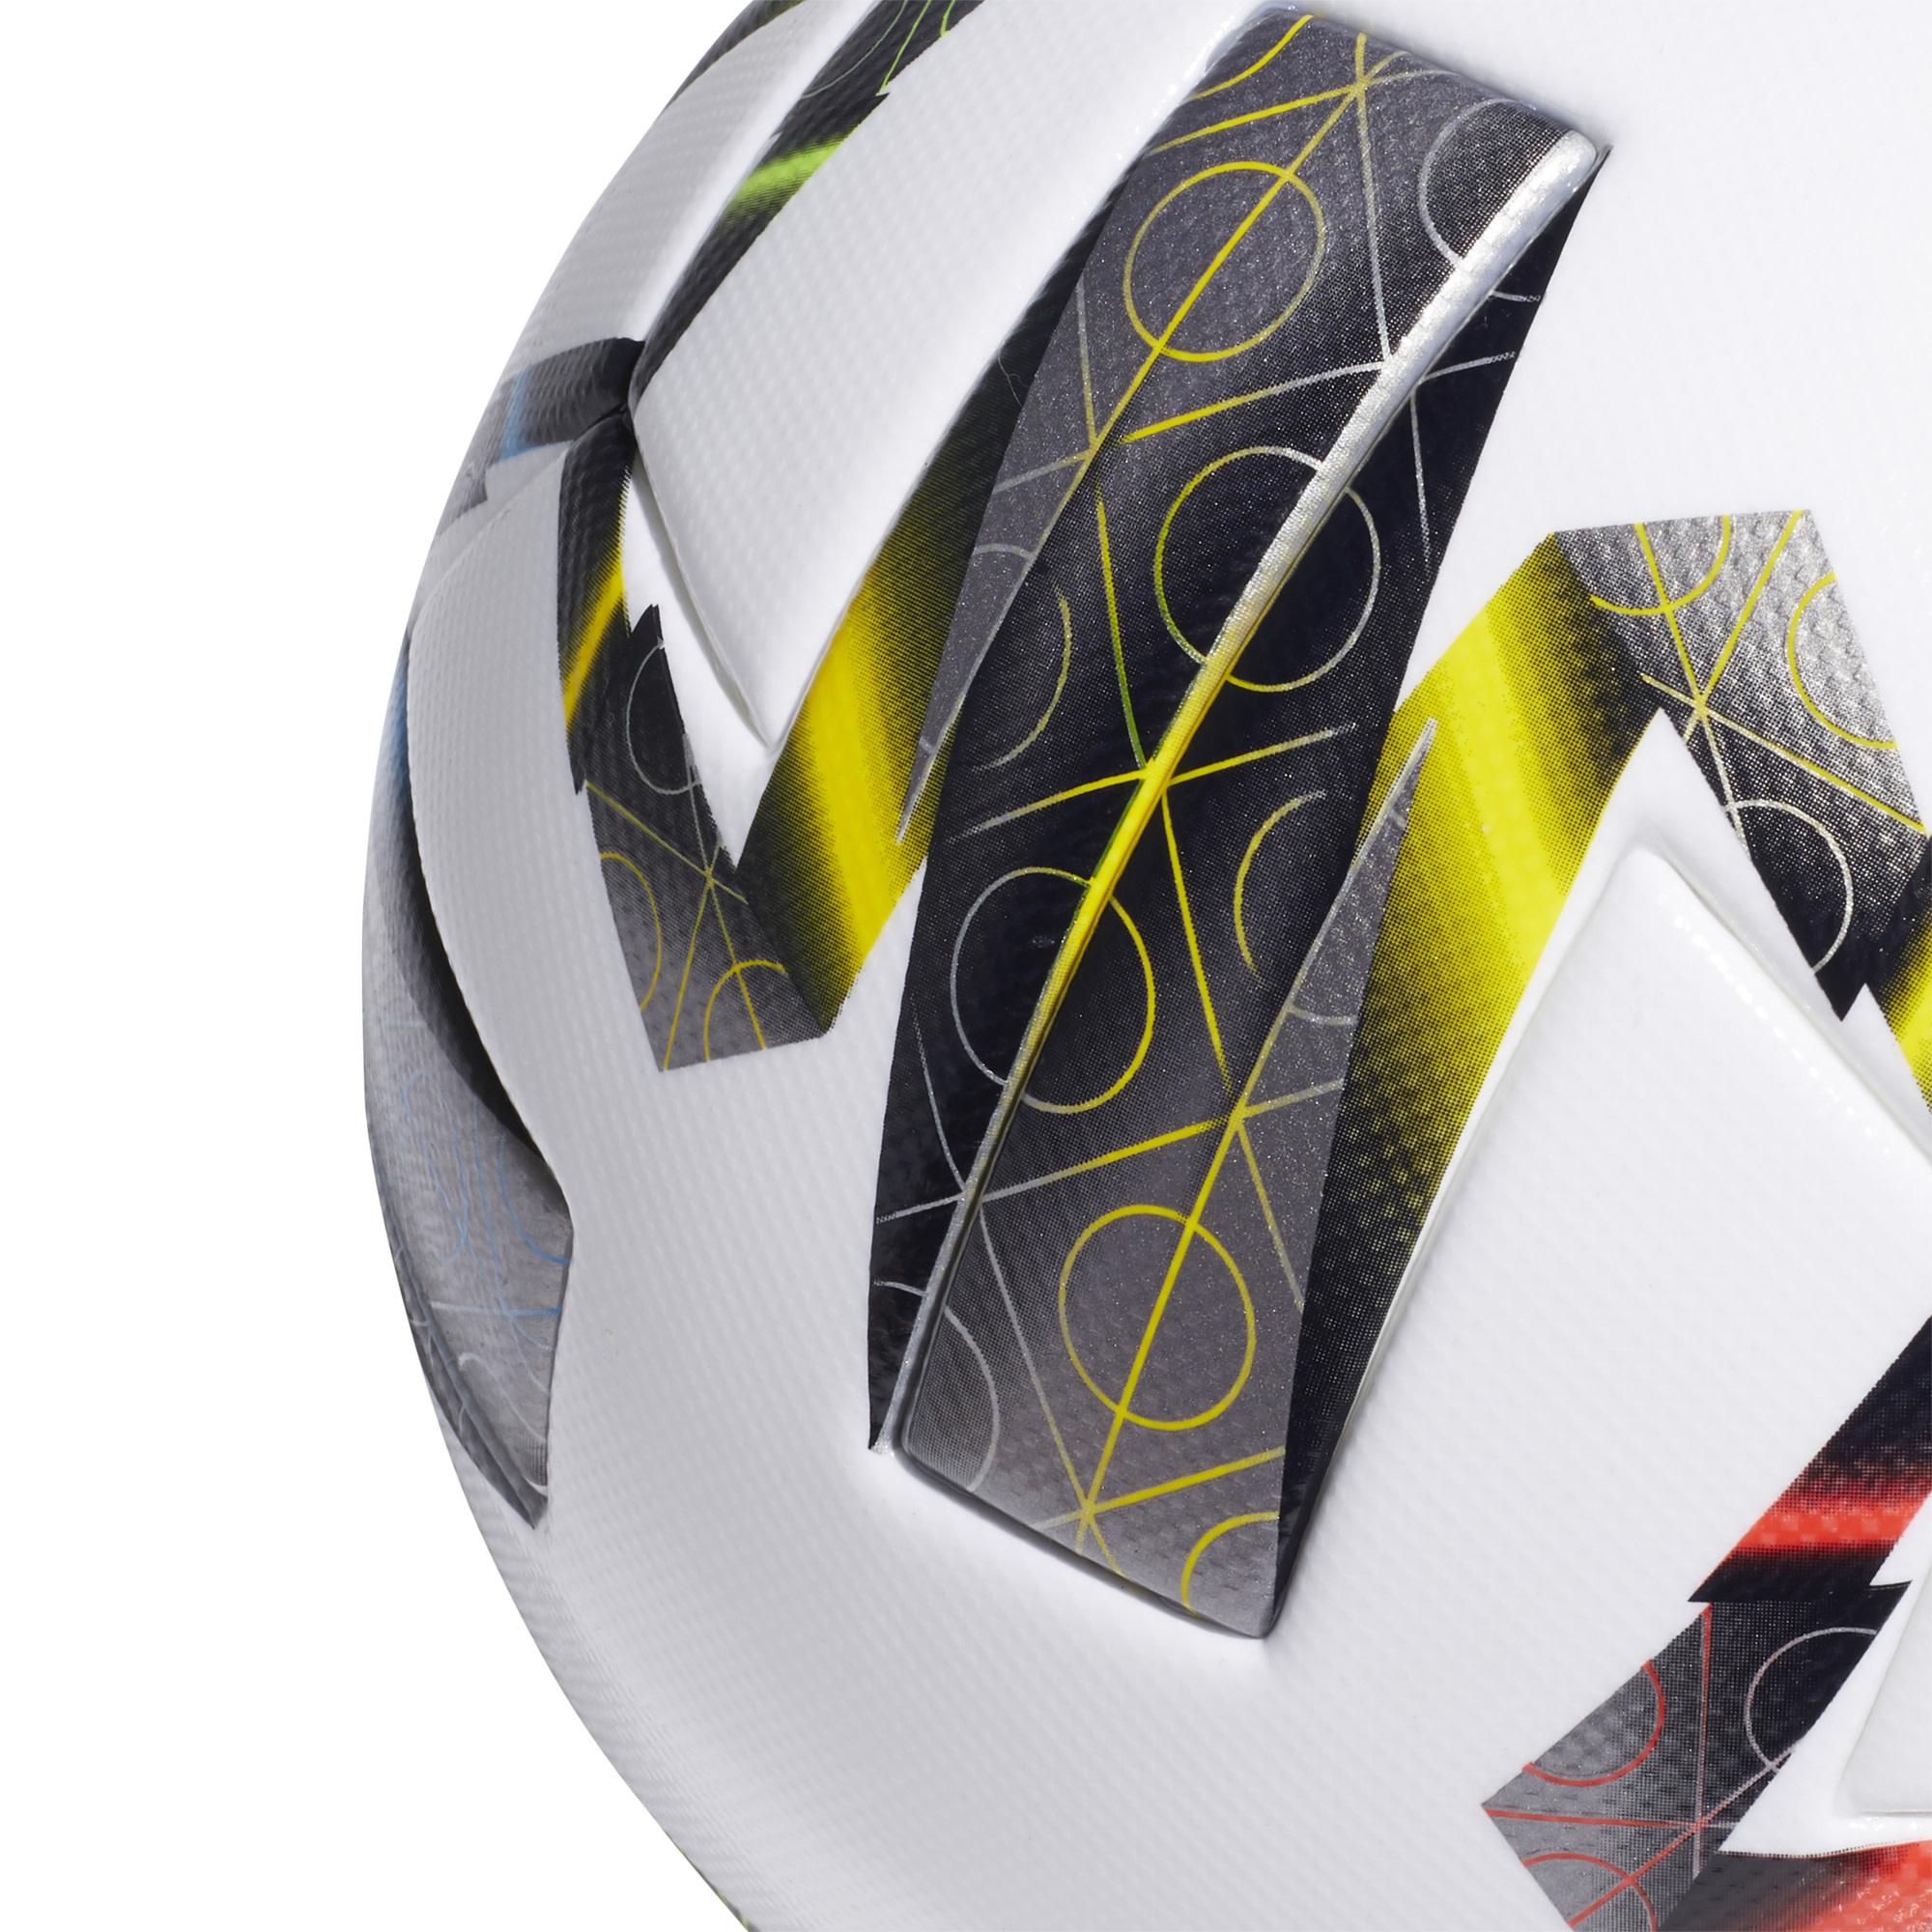 Adidas ADIDAS UEFA Nations League Ball